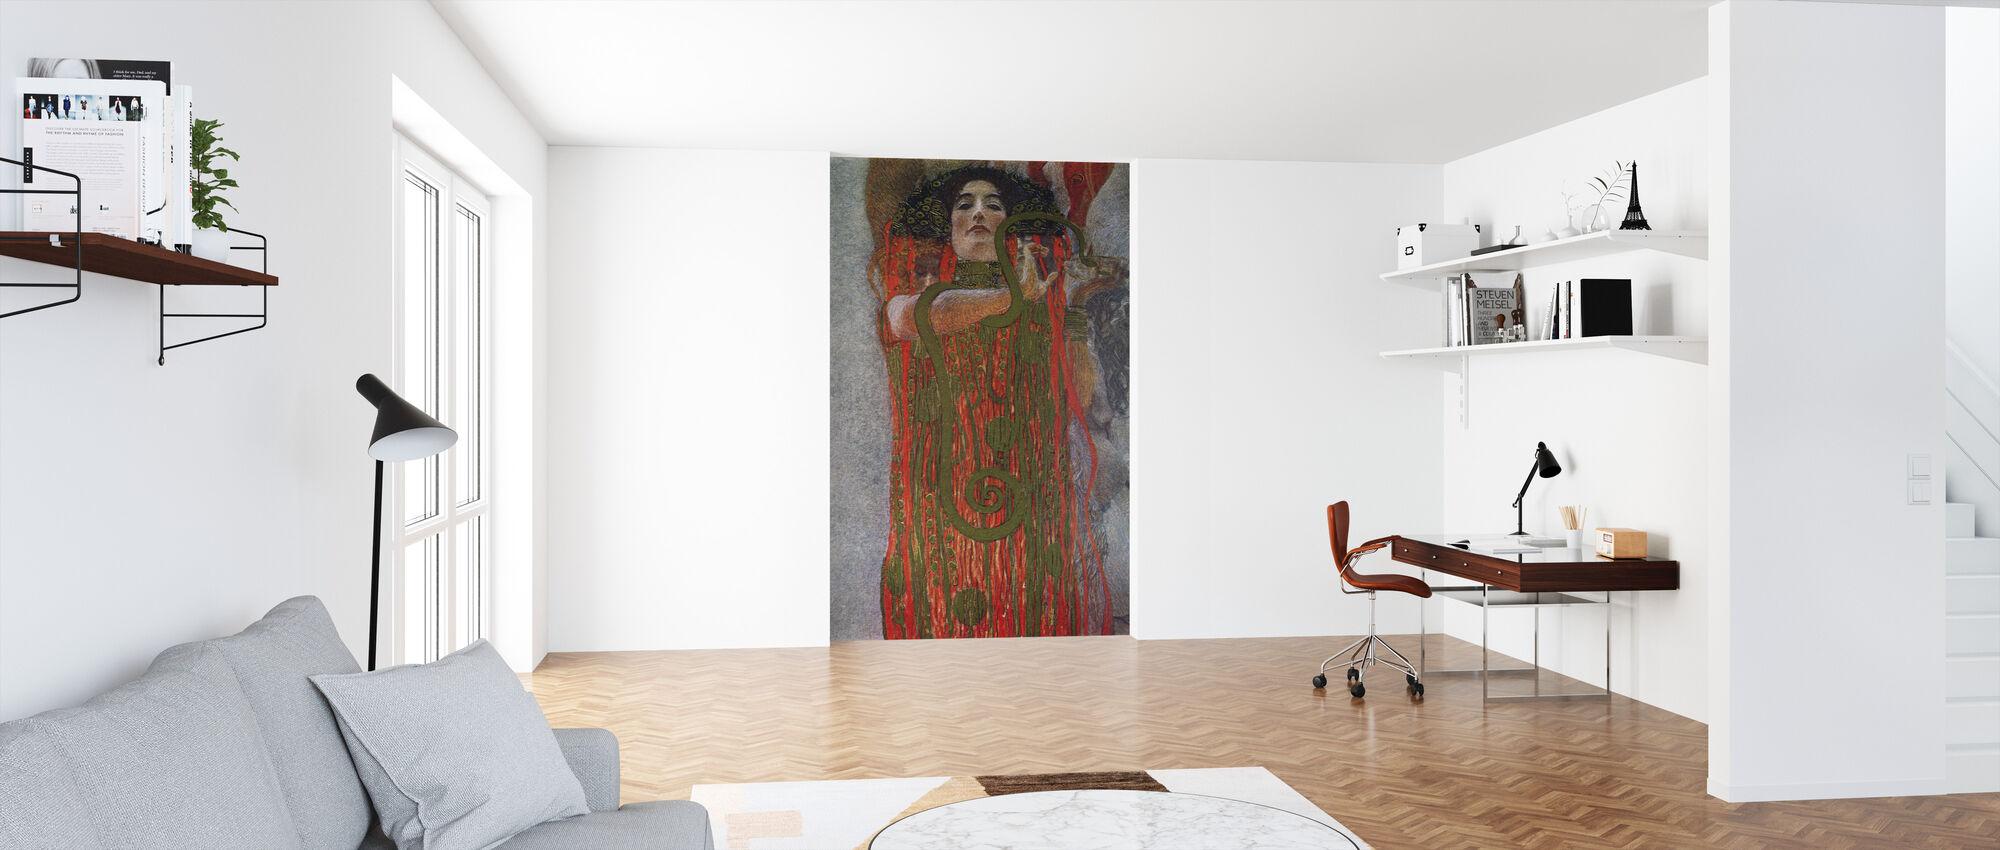 Hygieia - Gustav Klimt - Tapet - Kontor